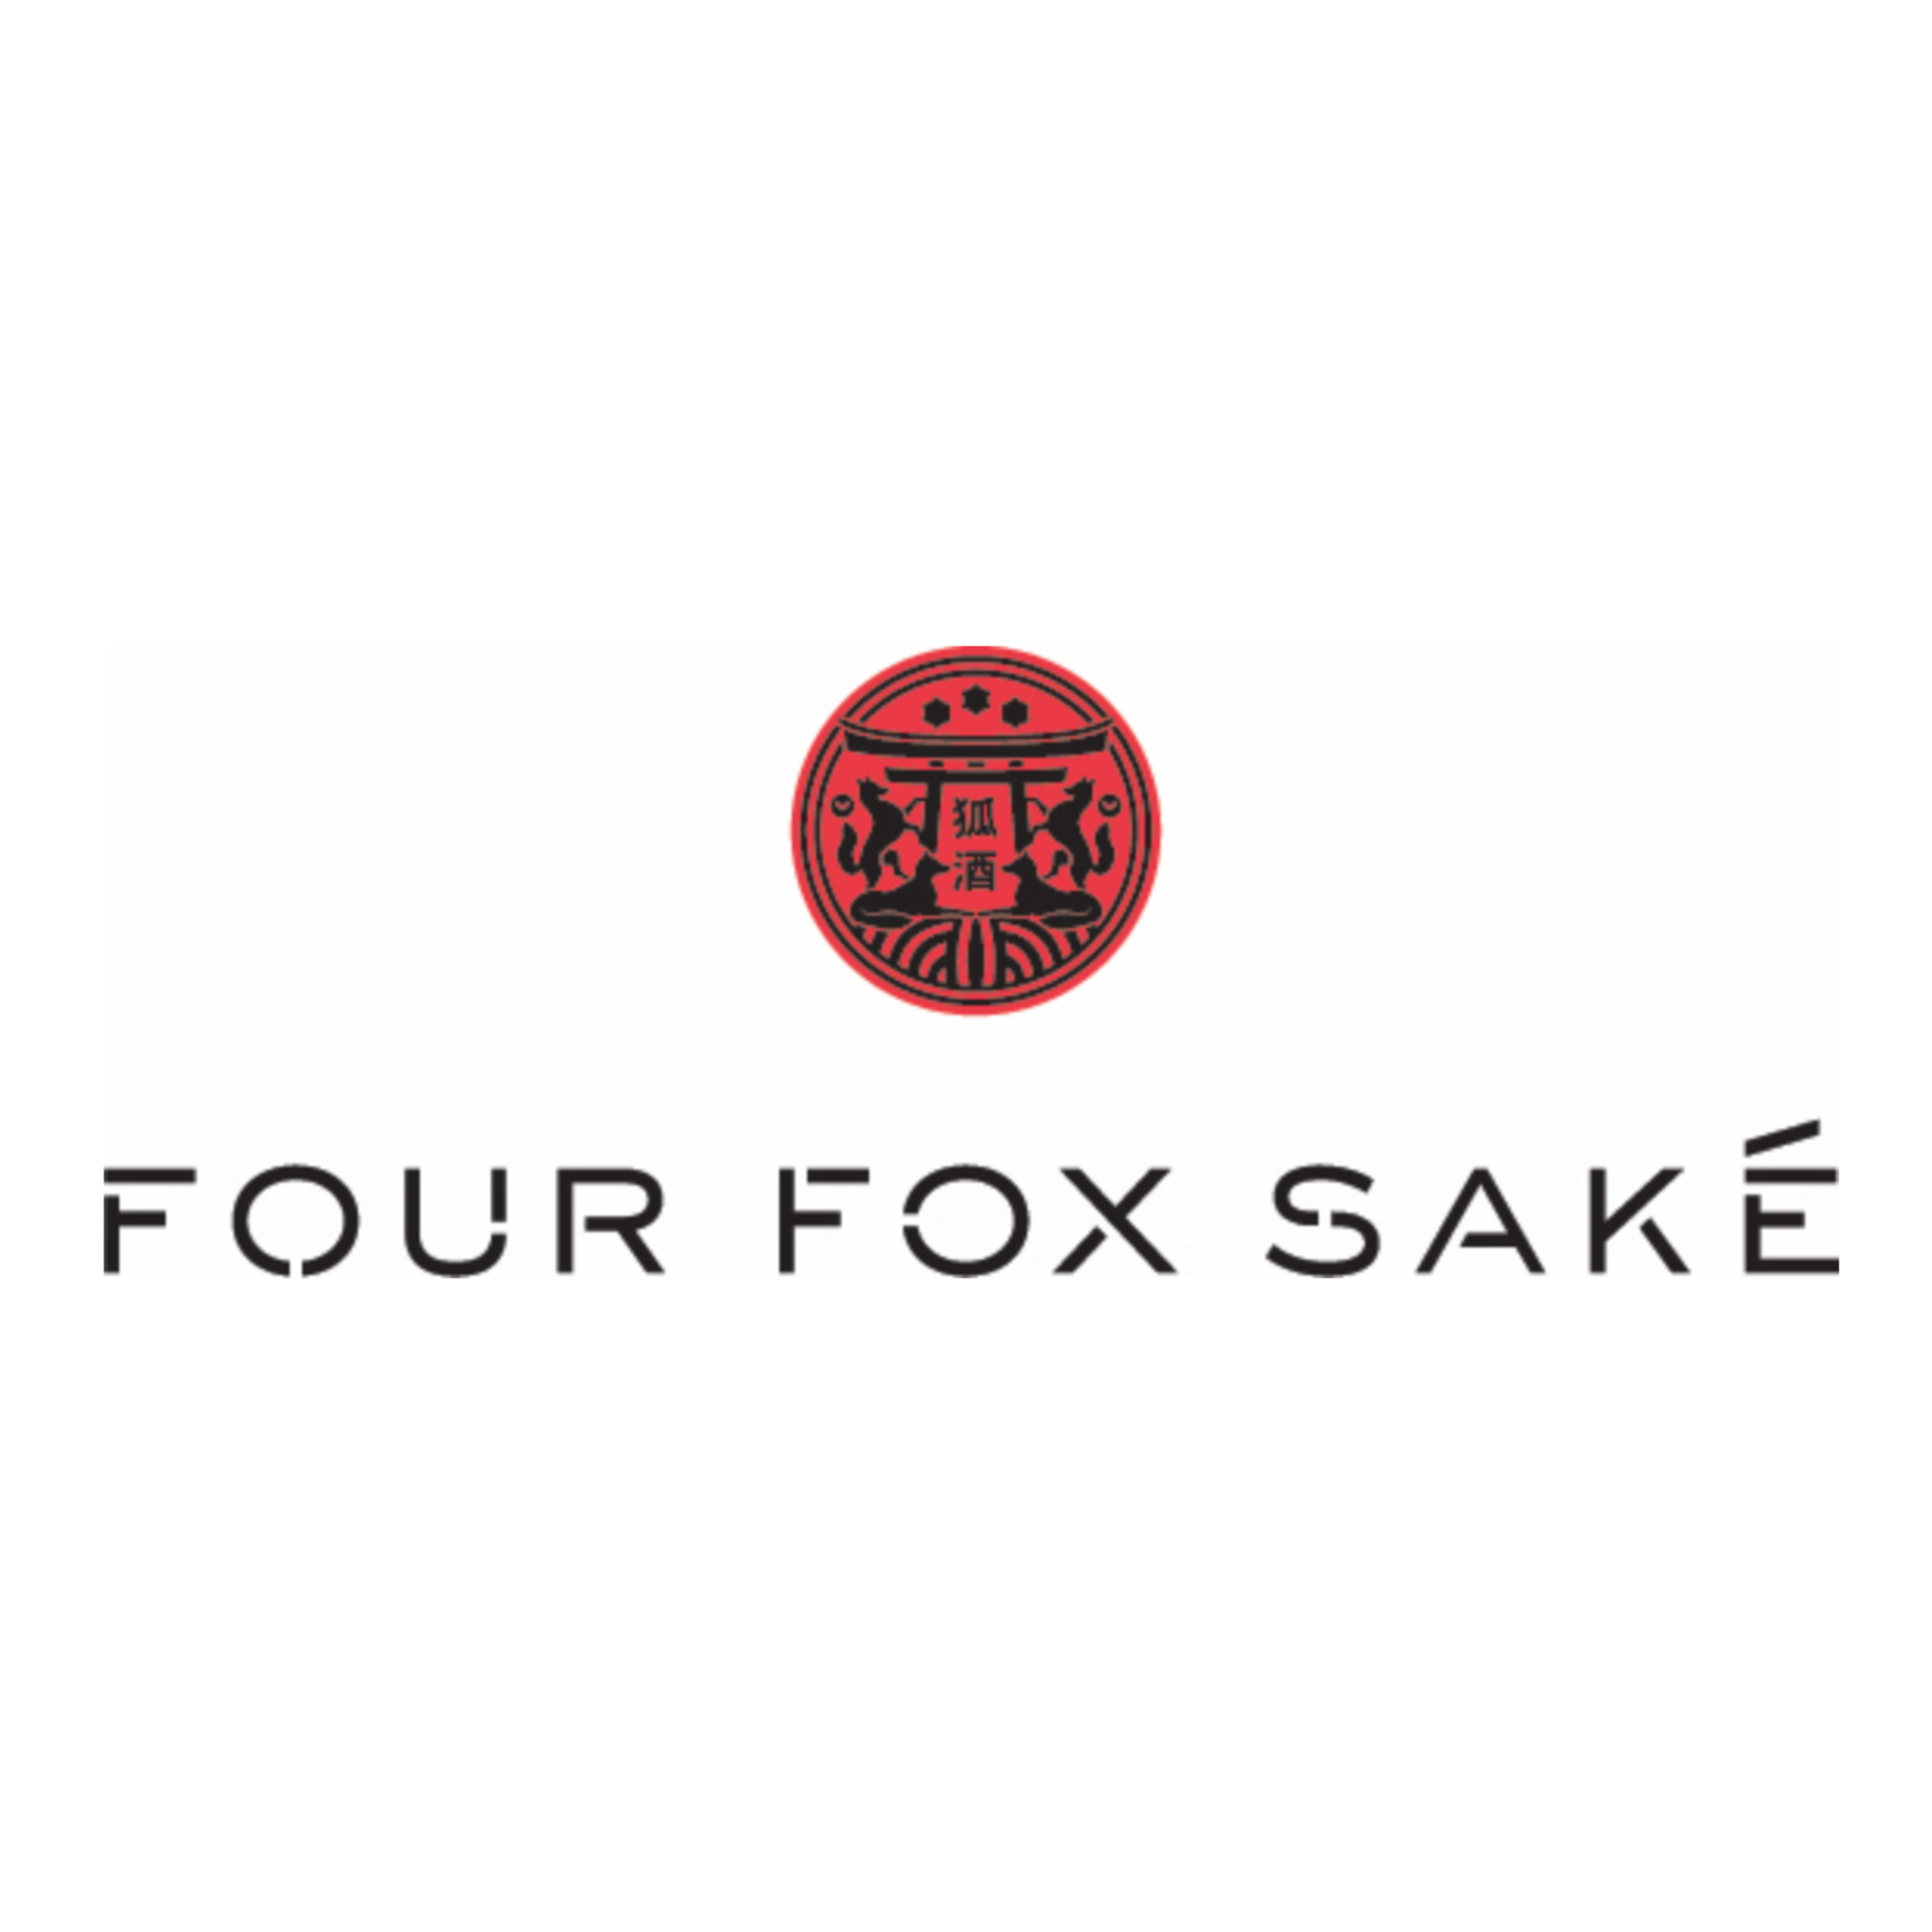 four fox sake- company logo